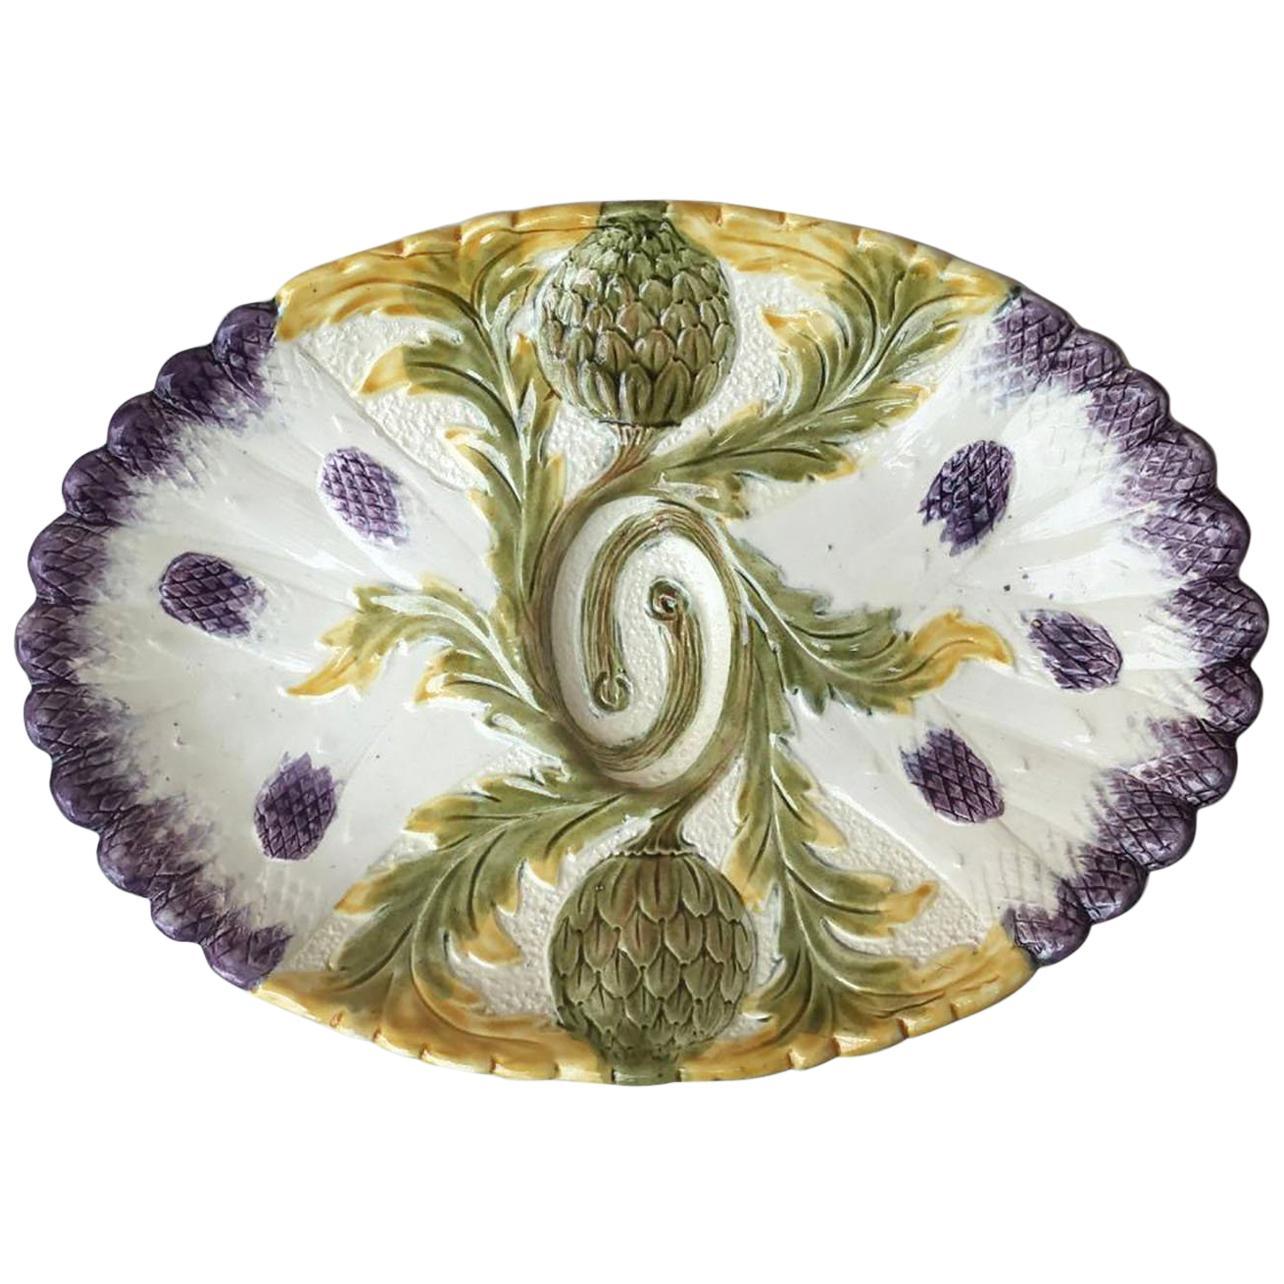 Majolica Asparagus Platter Orchies, circa 1880